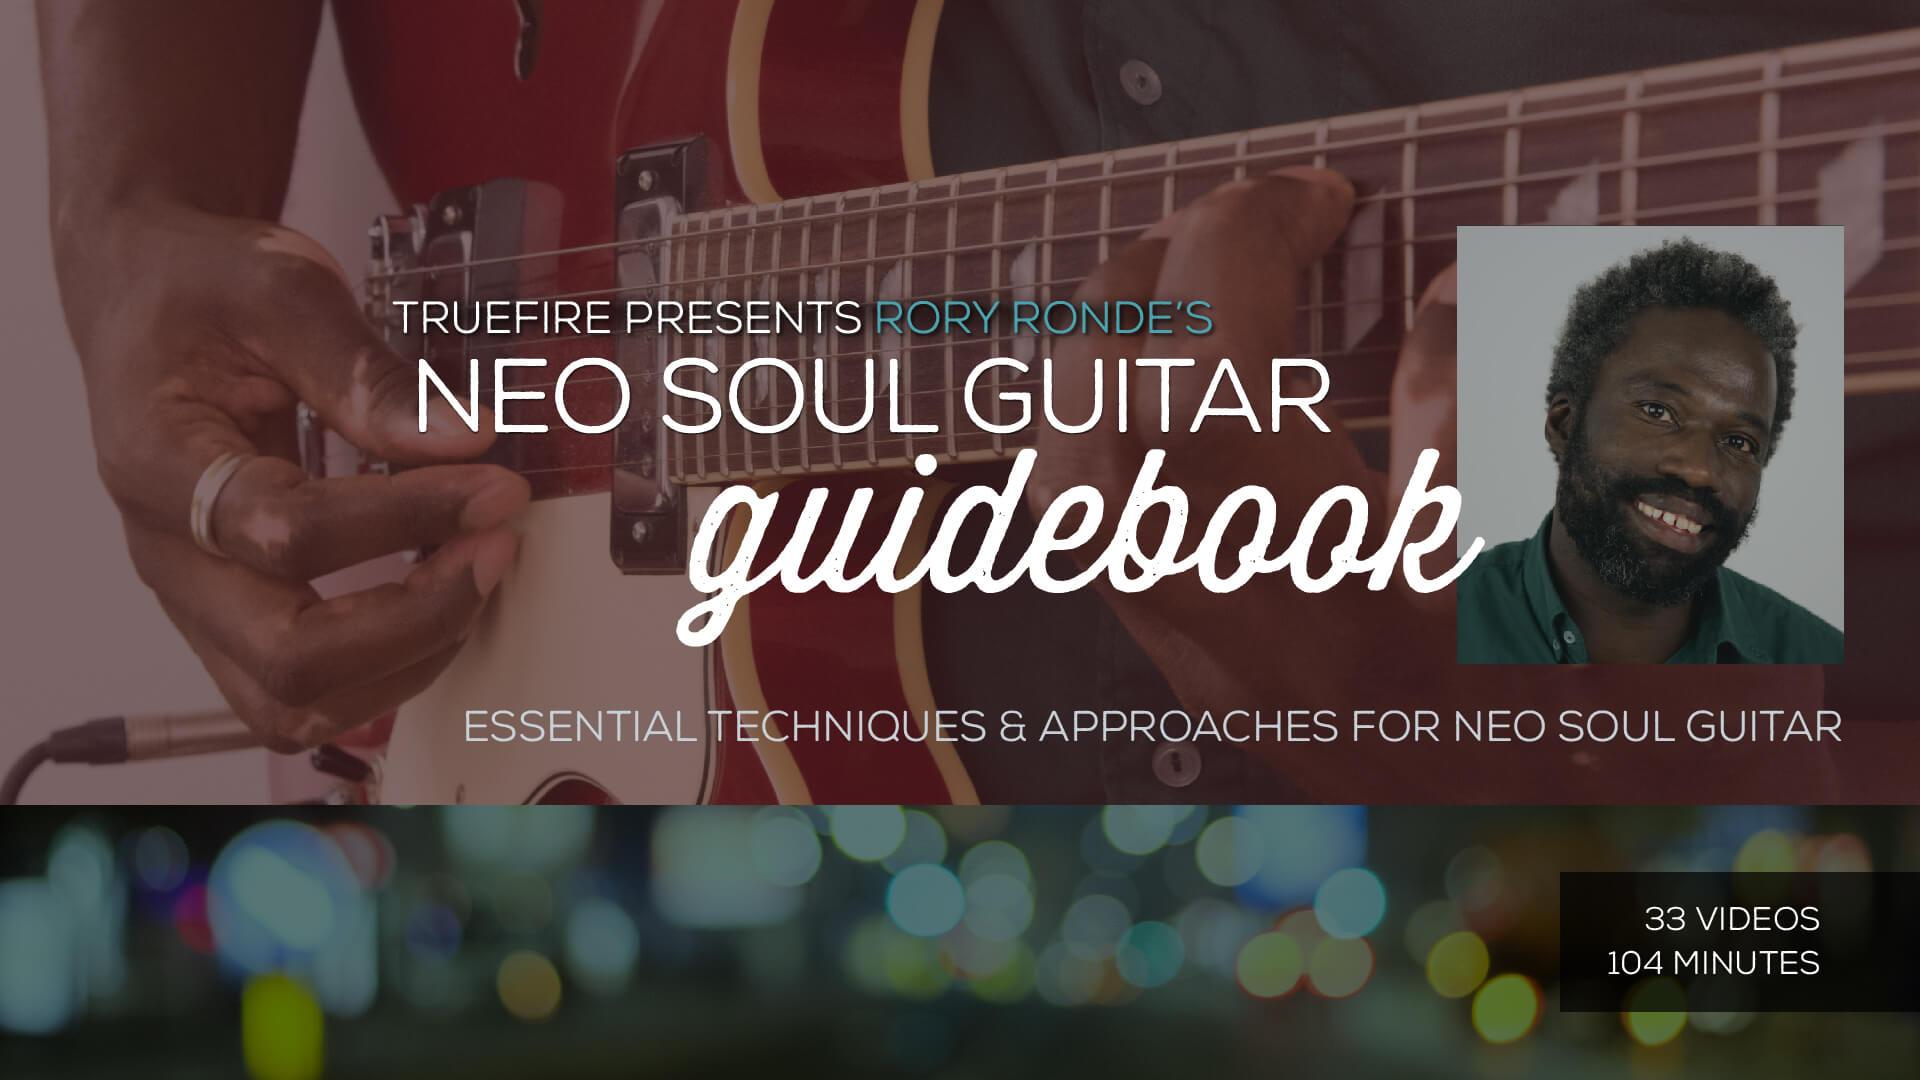 Neo Soul Guitar Lessons Truefire